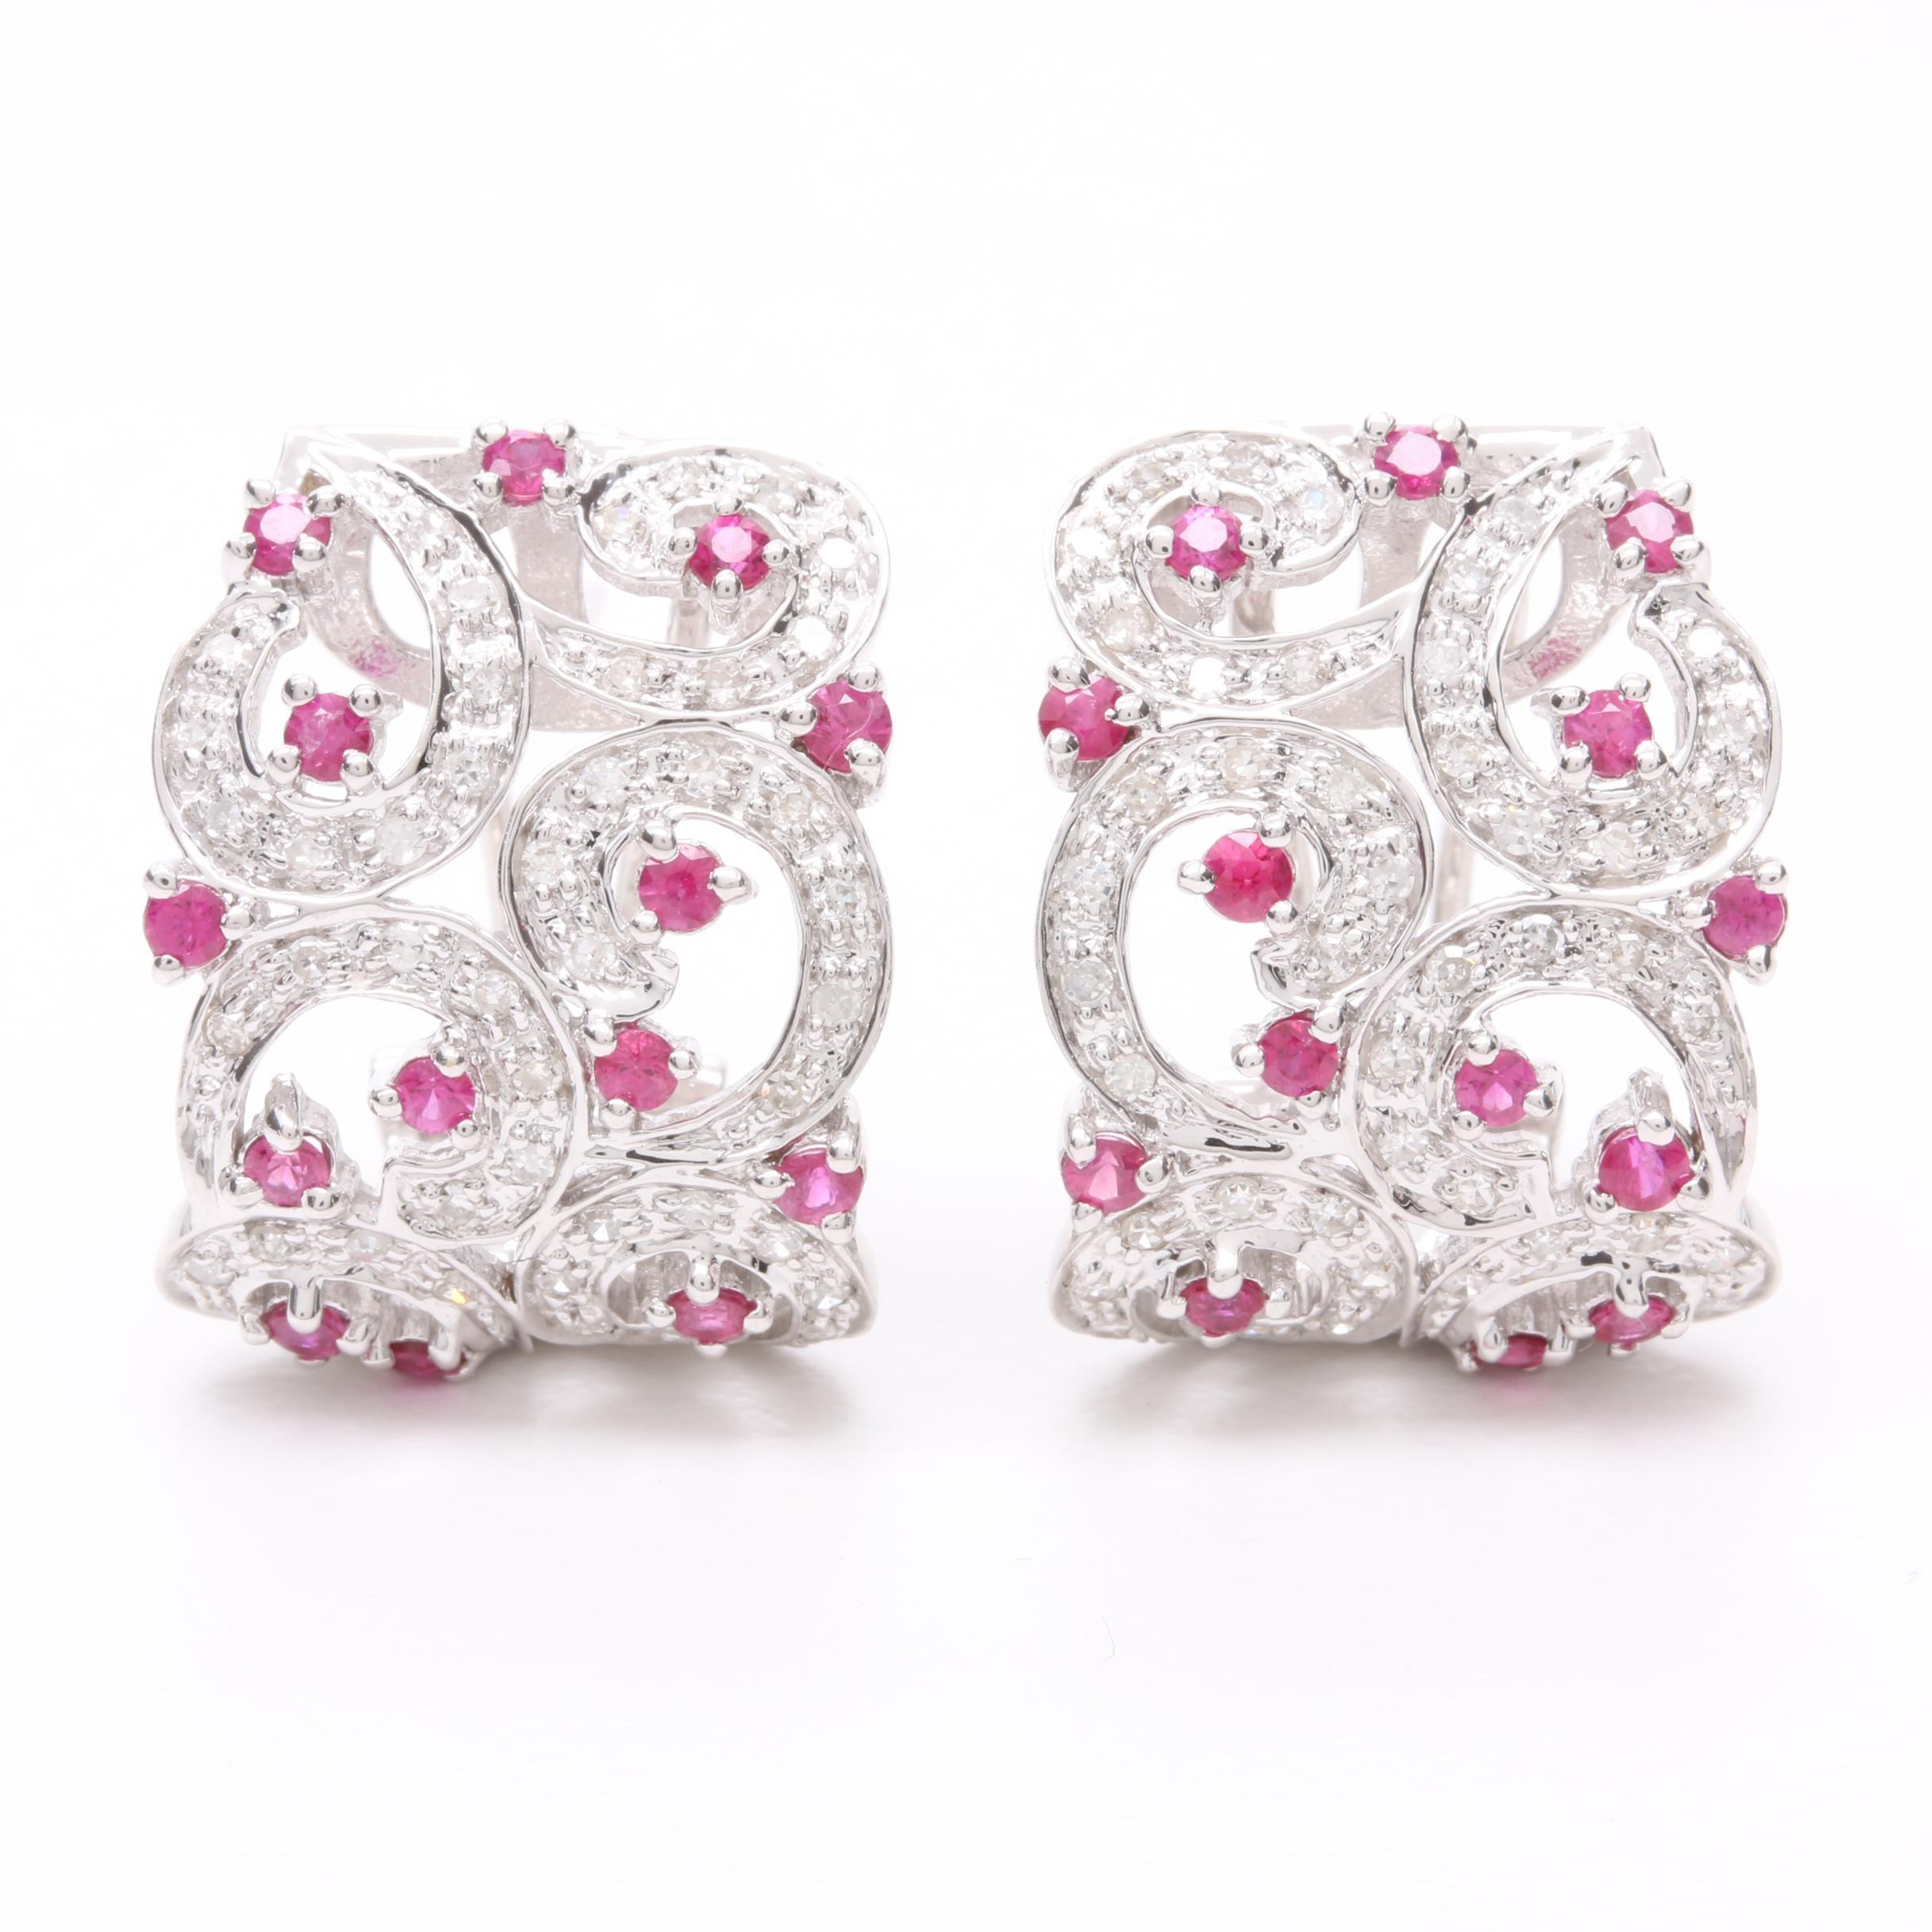 14K White Gold Pink Sapphire and Diamond J-Hoop Earrings